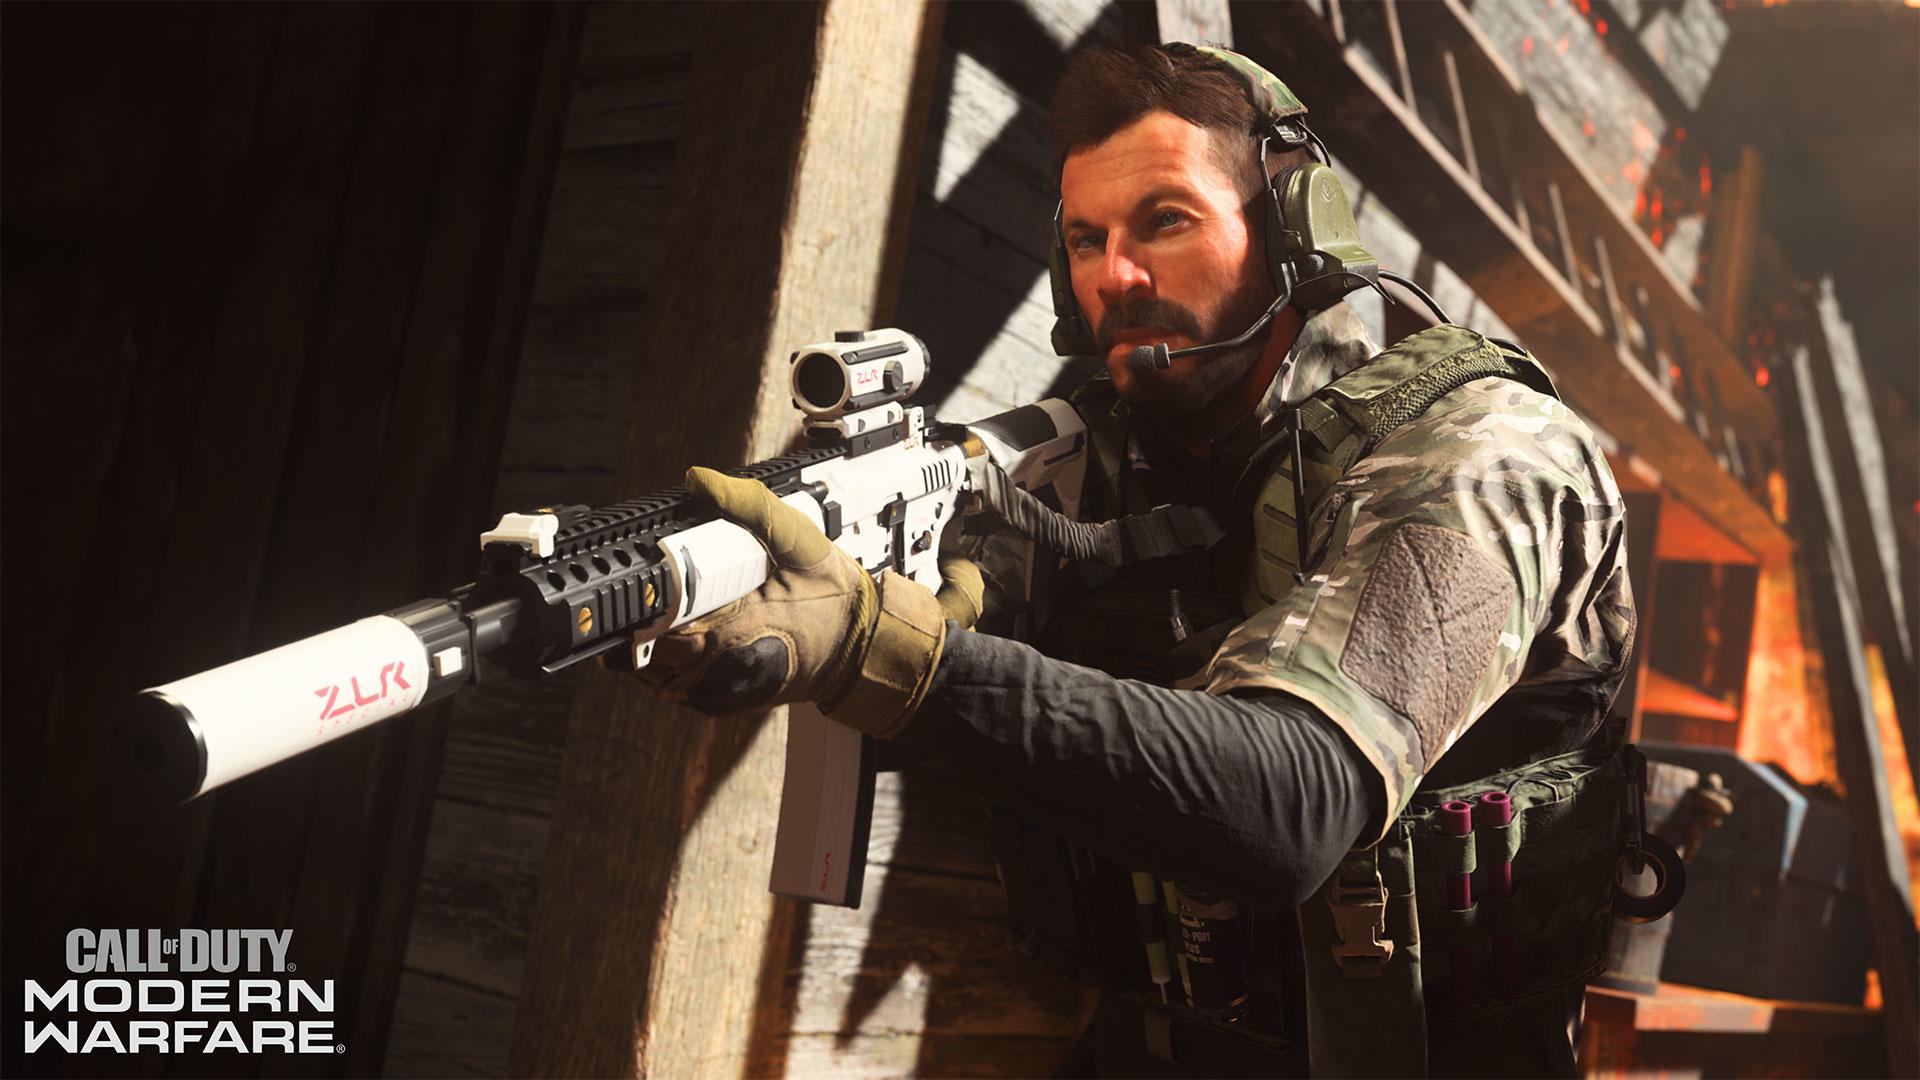 2020 Call Of Duty Modern Warfare Wallpaper Hd Games 4k Wallpapers